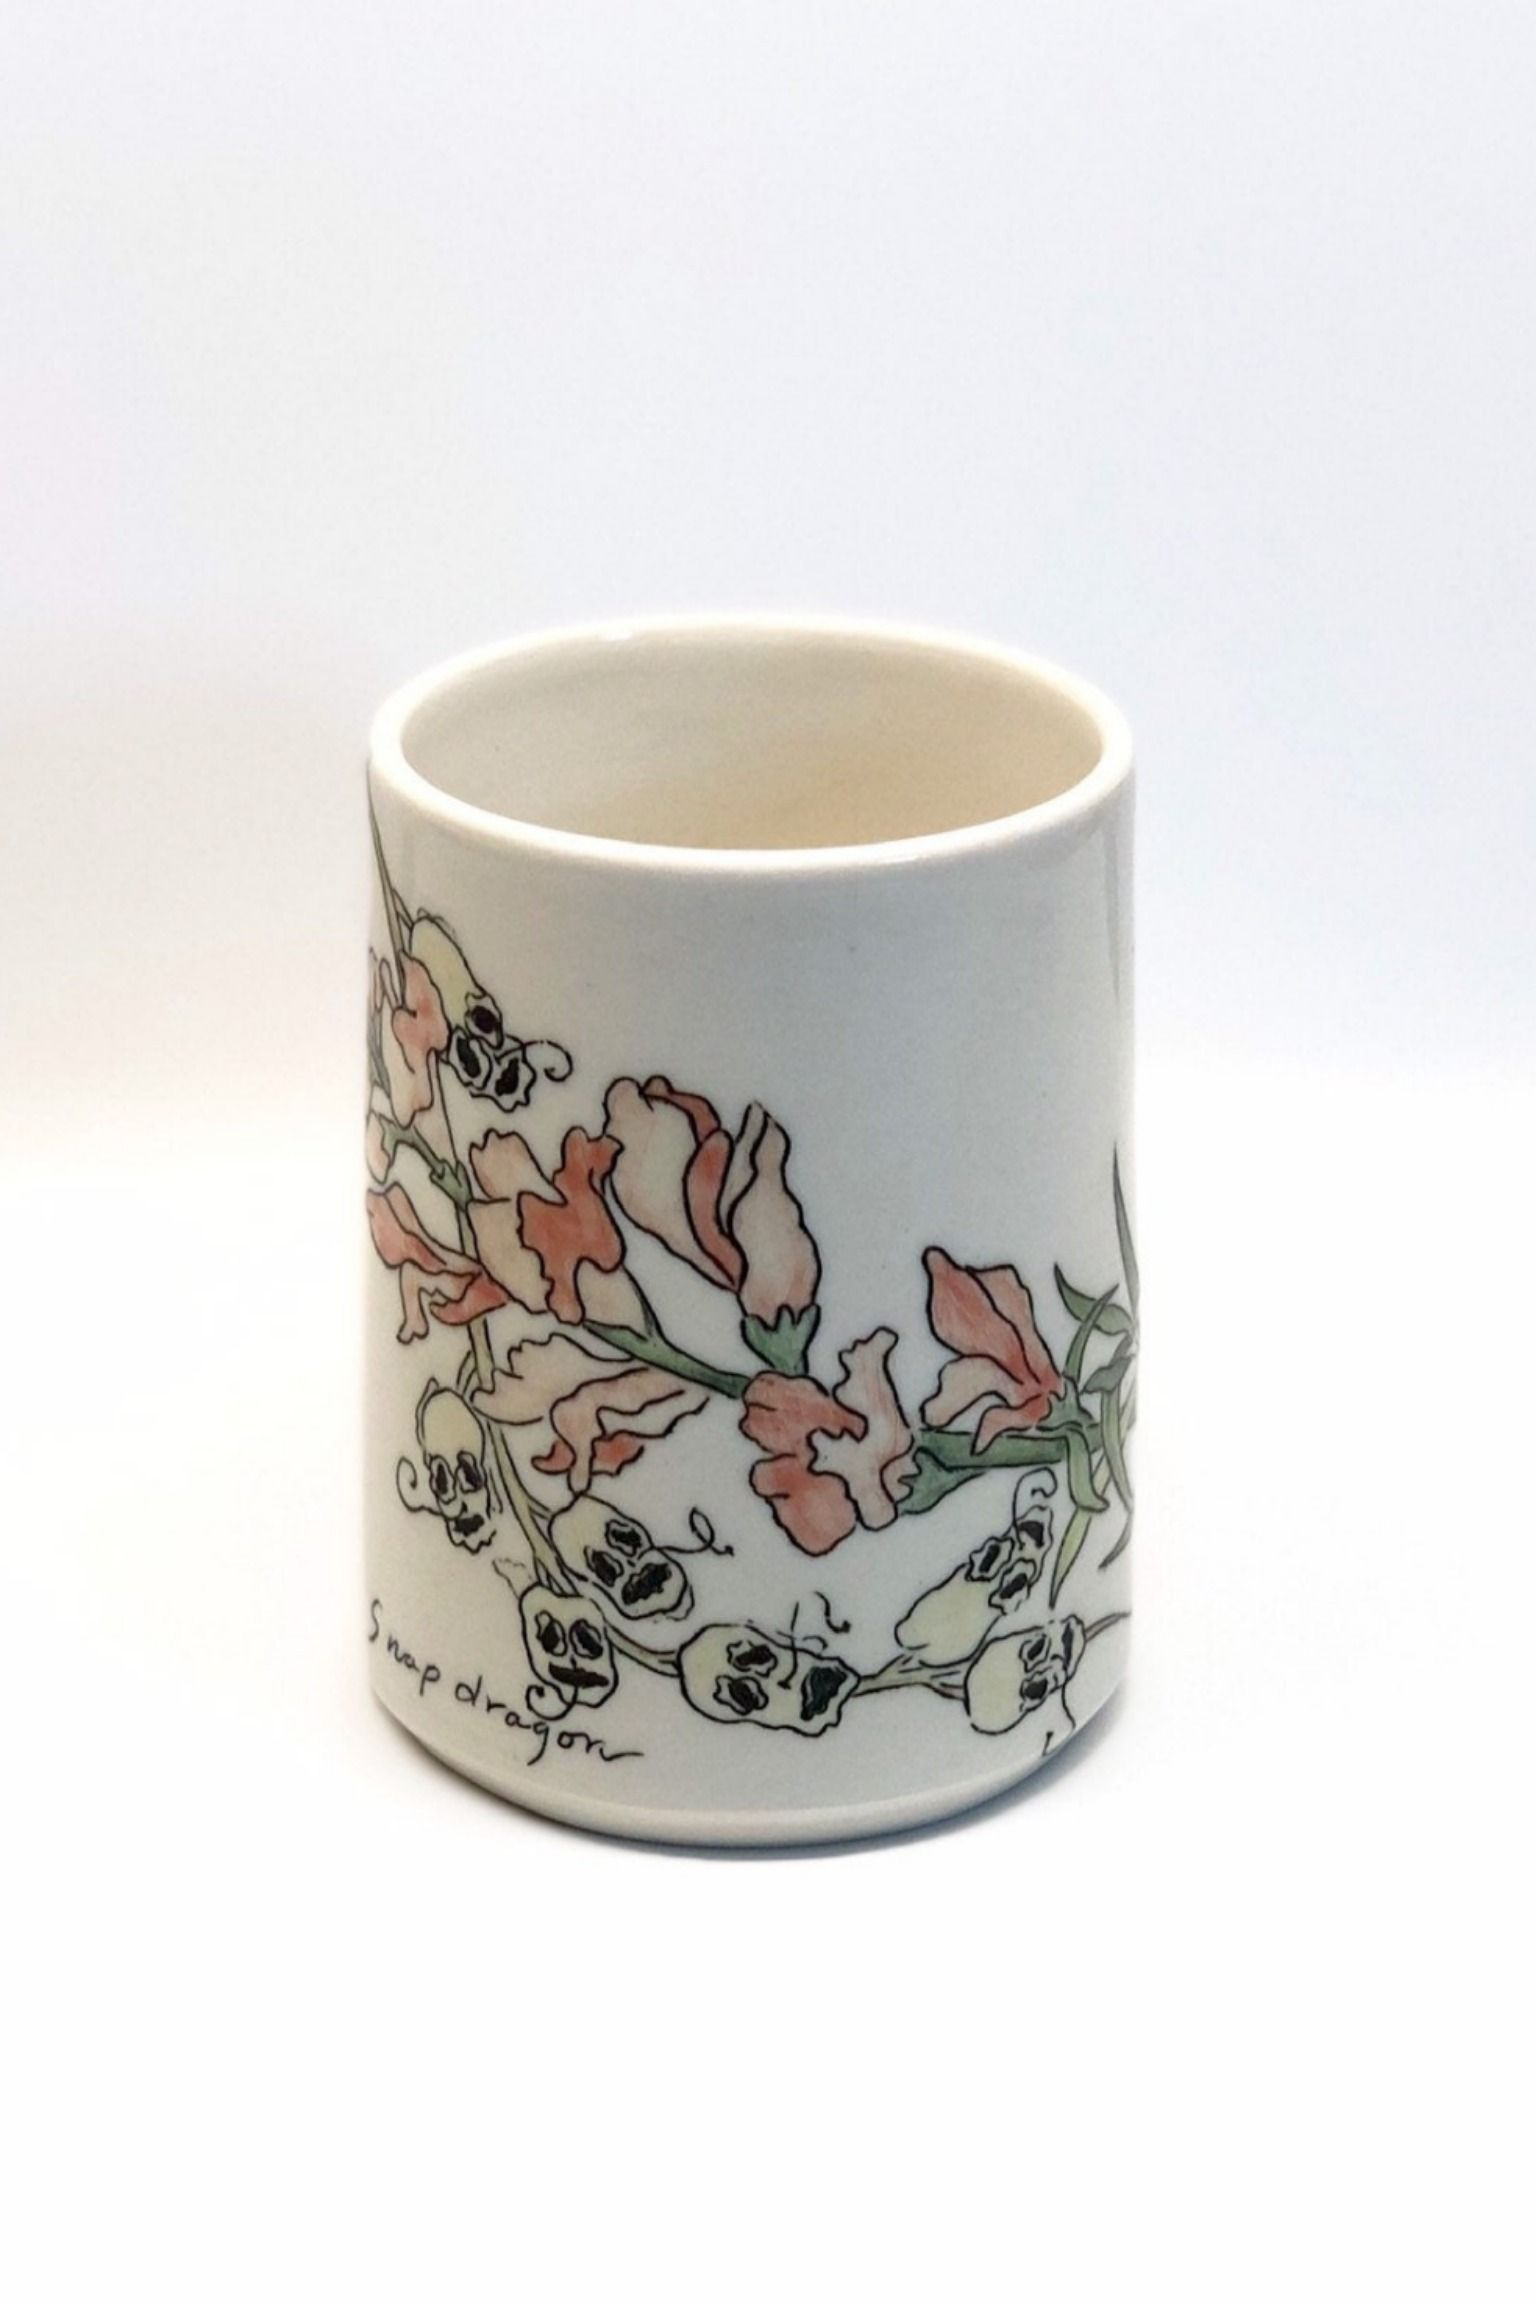 Hand Painted Snapdragon Coffee Mug Mishima Inlay Flower Skull Porcelain Mug Wheel Thrown Snapdragon Flowers Pottery Pieces Hand Painted